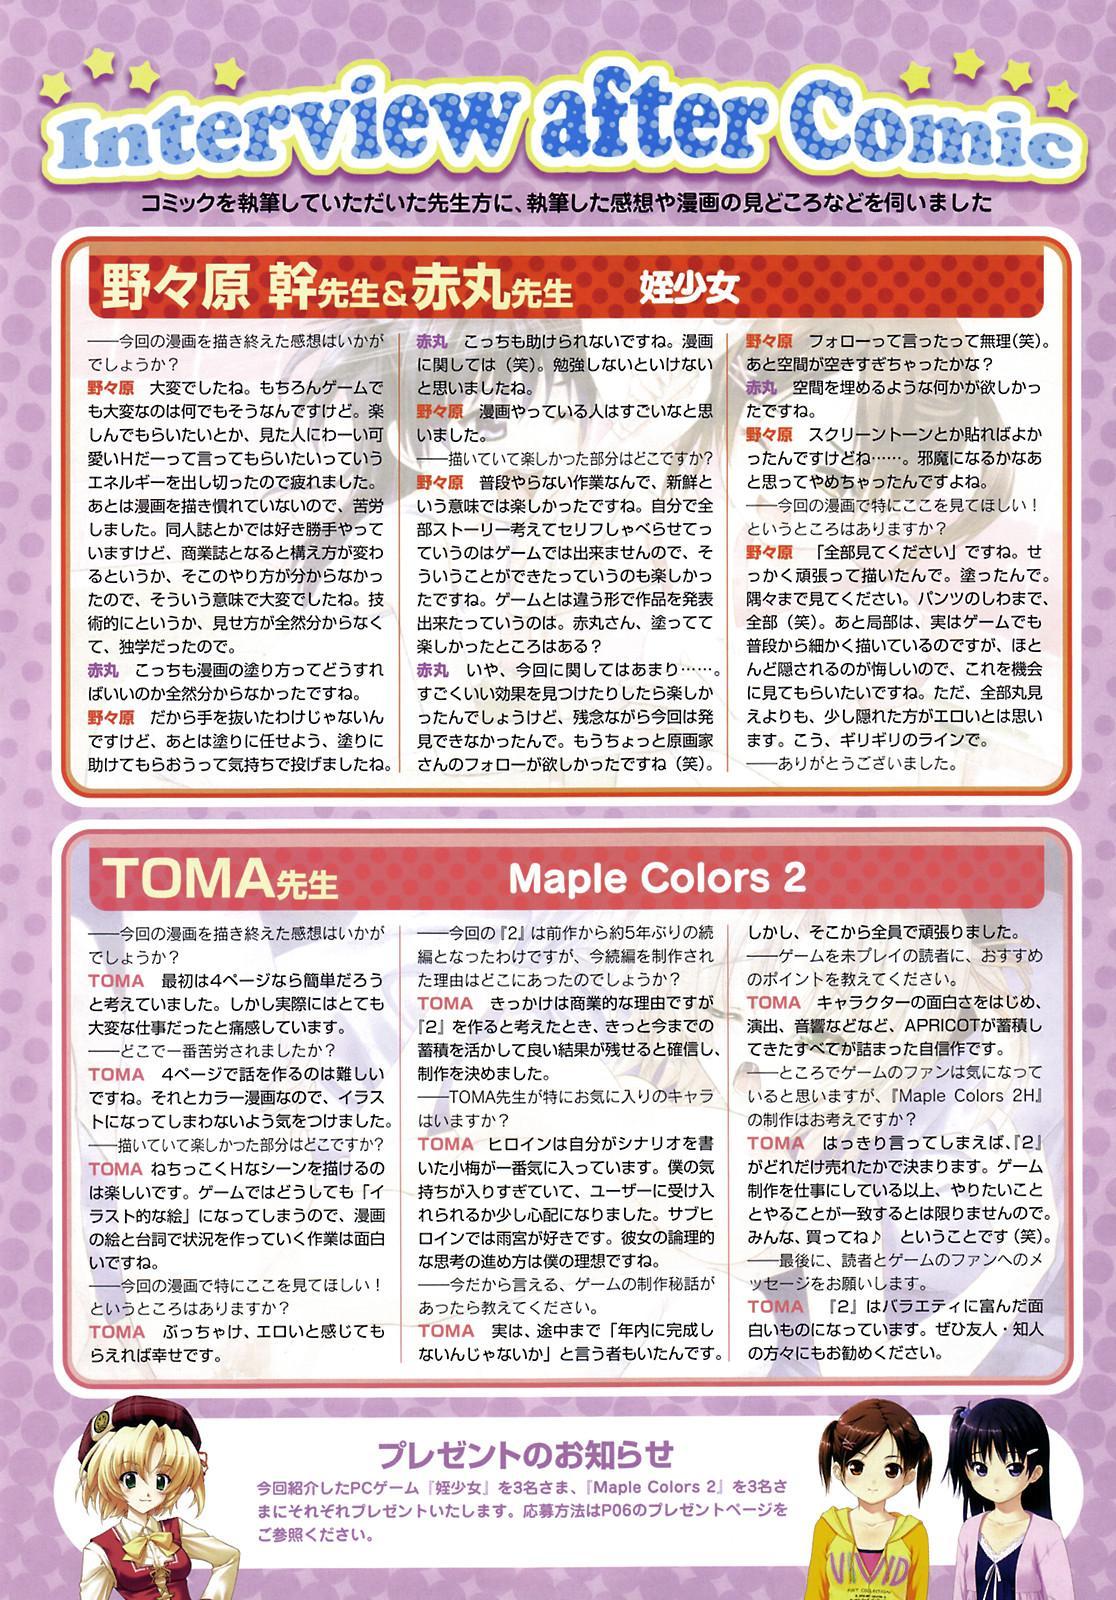 COMIC Megastore 2009-04 21